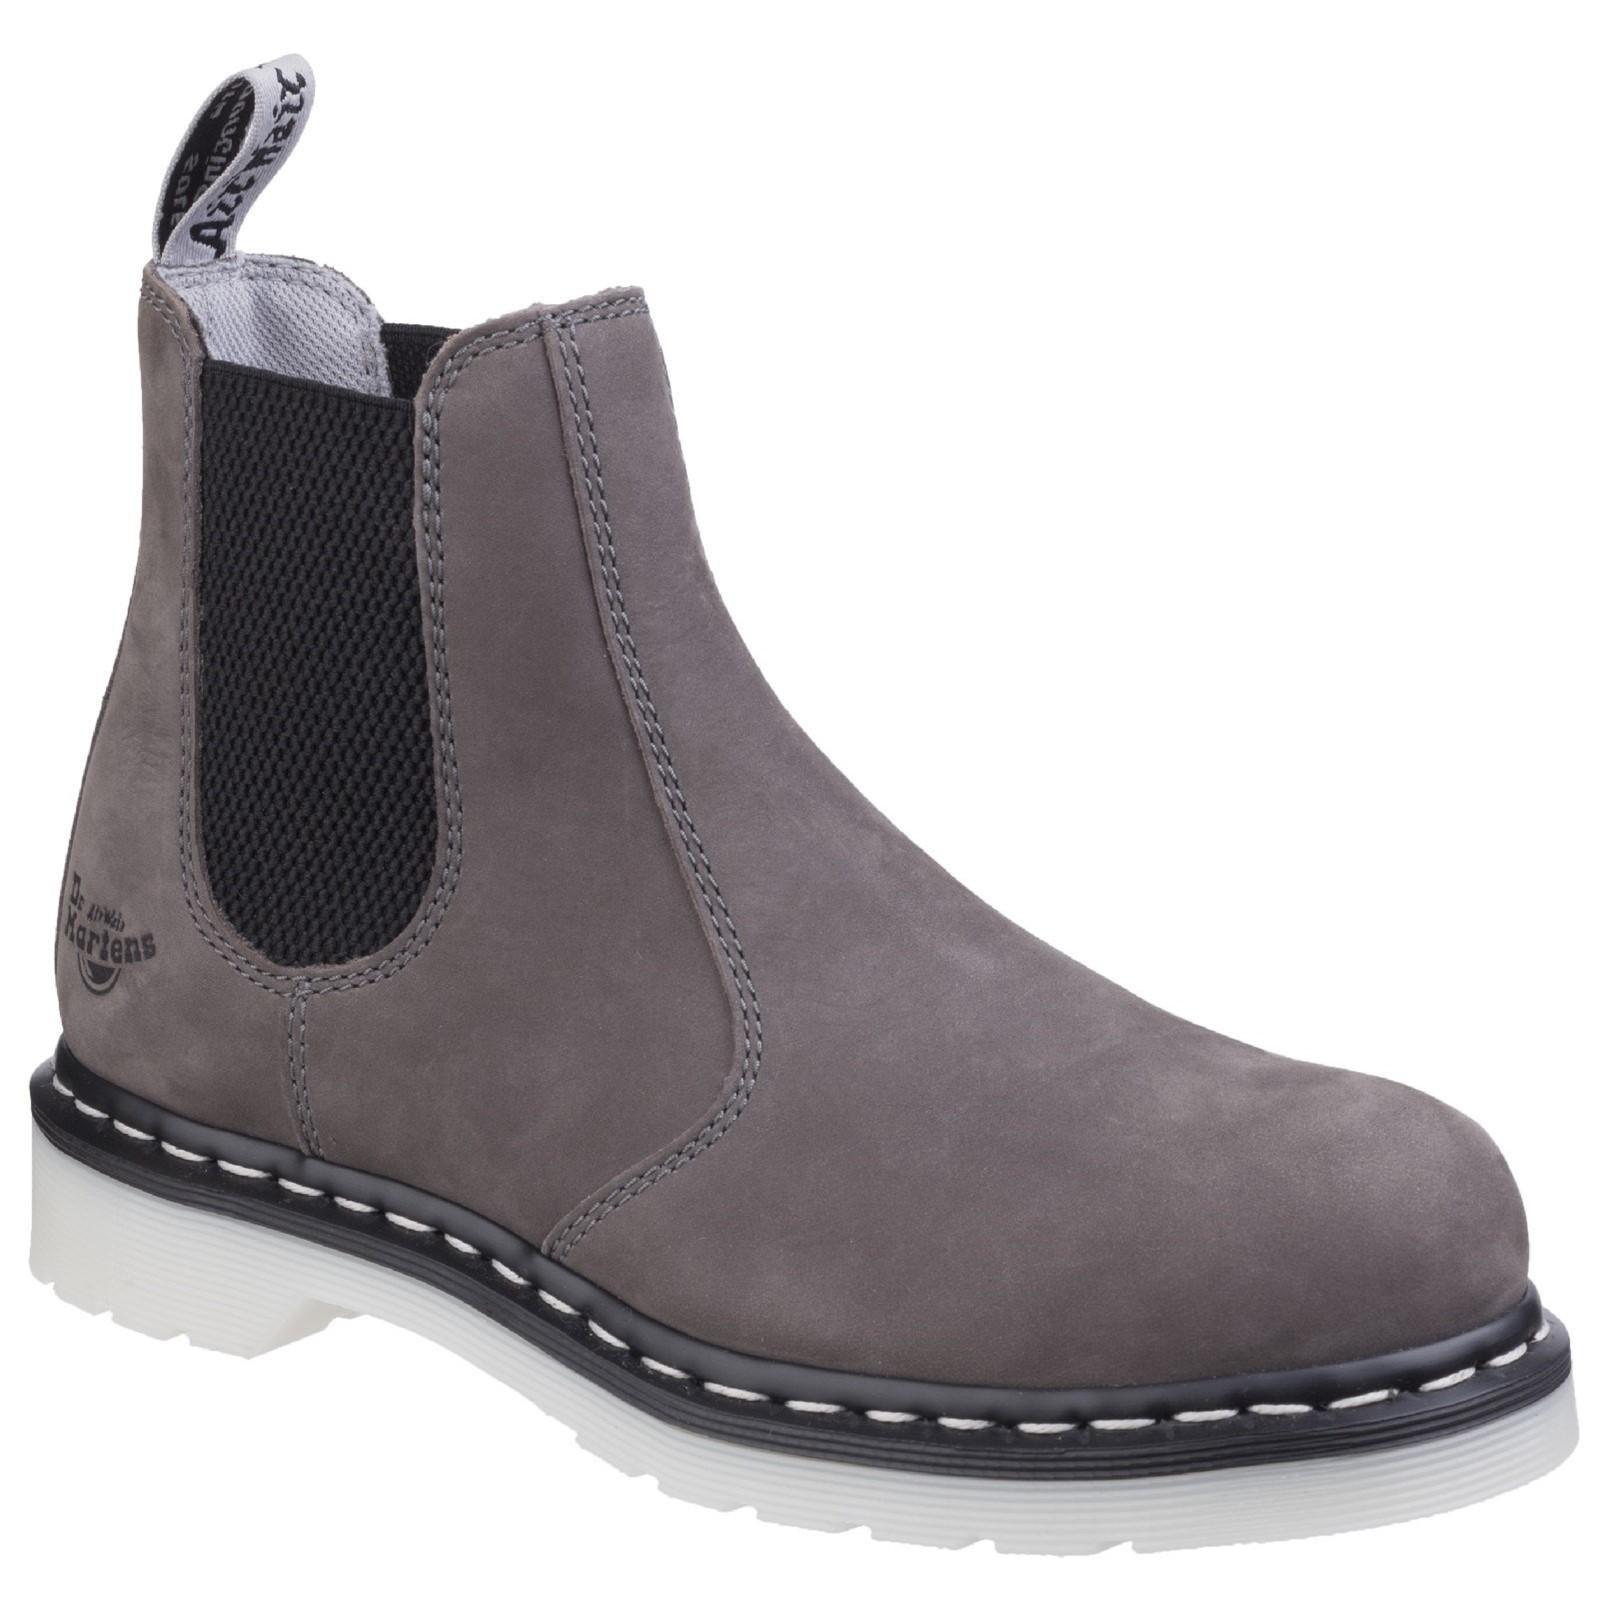 Dr. Martens Women's Arbor Steel Toe Light Industry Boots